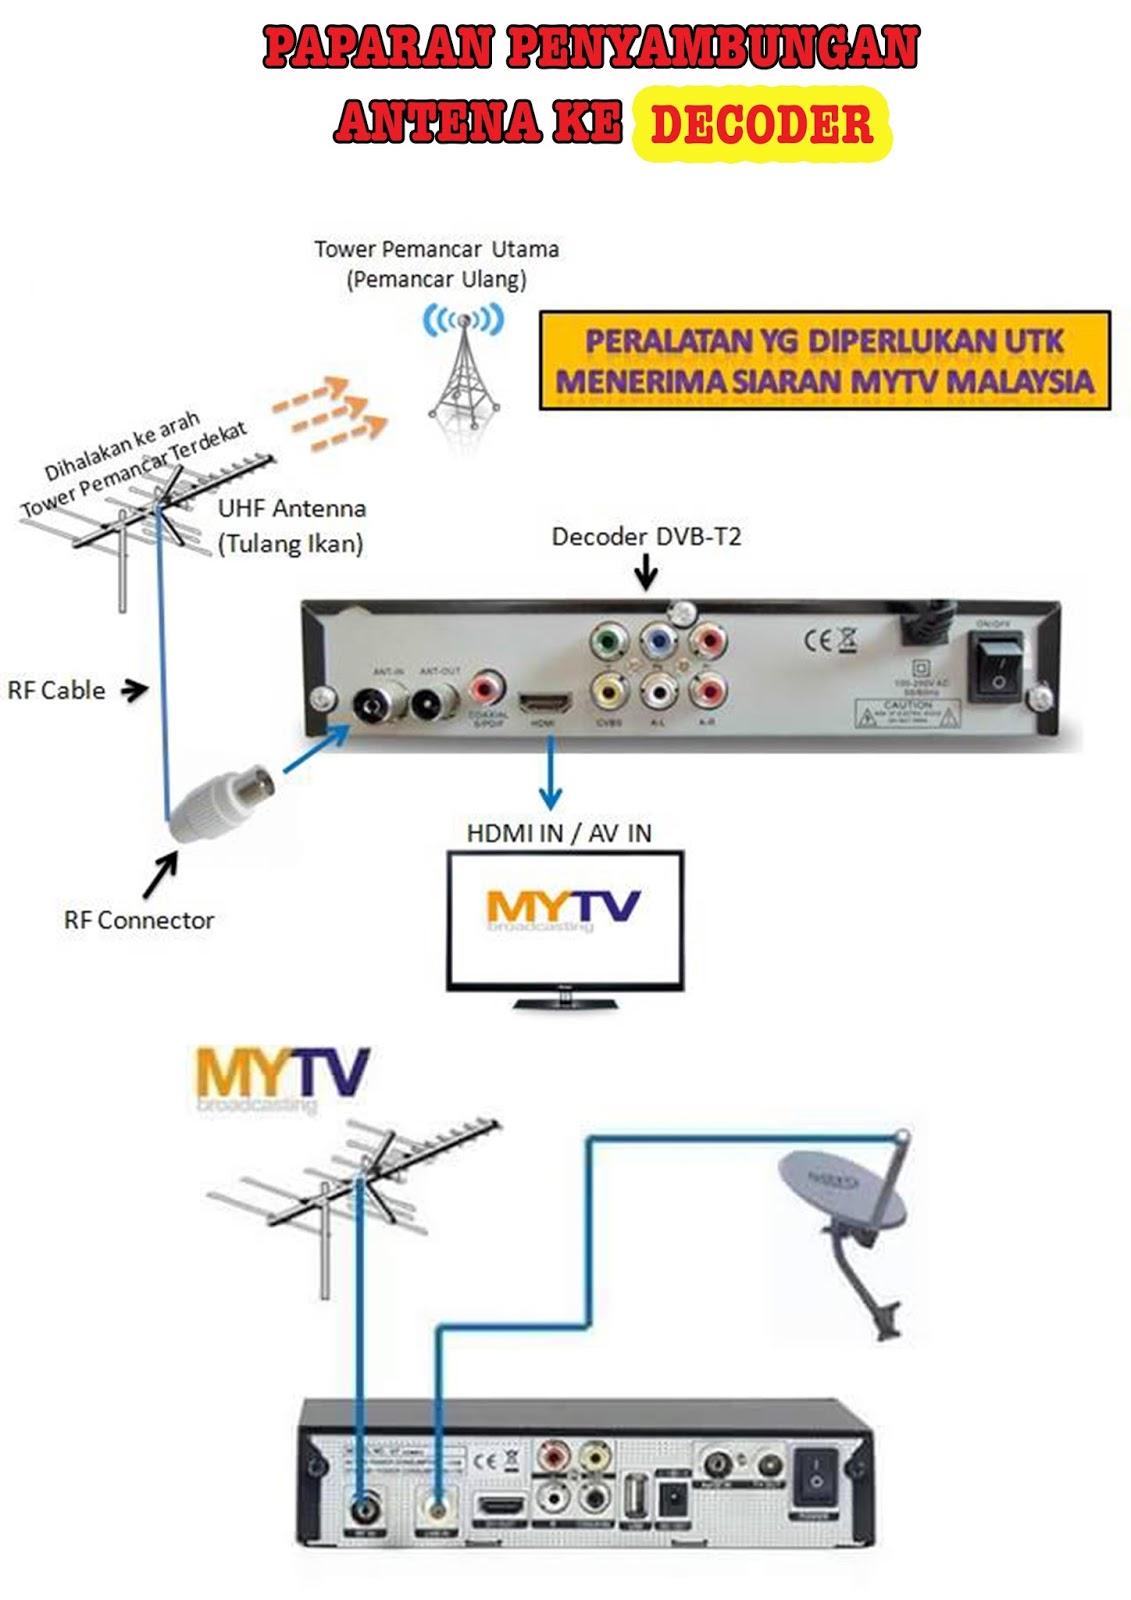 MyTV: Cara setting MYTV